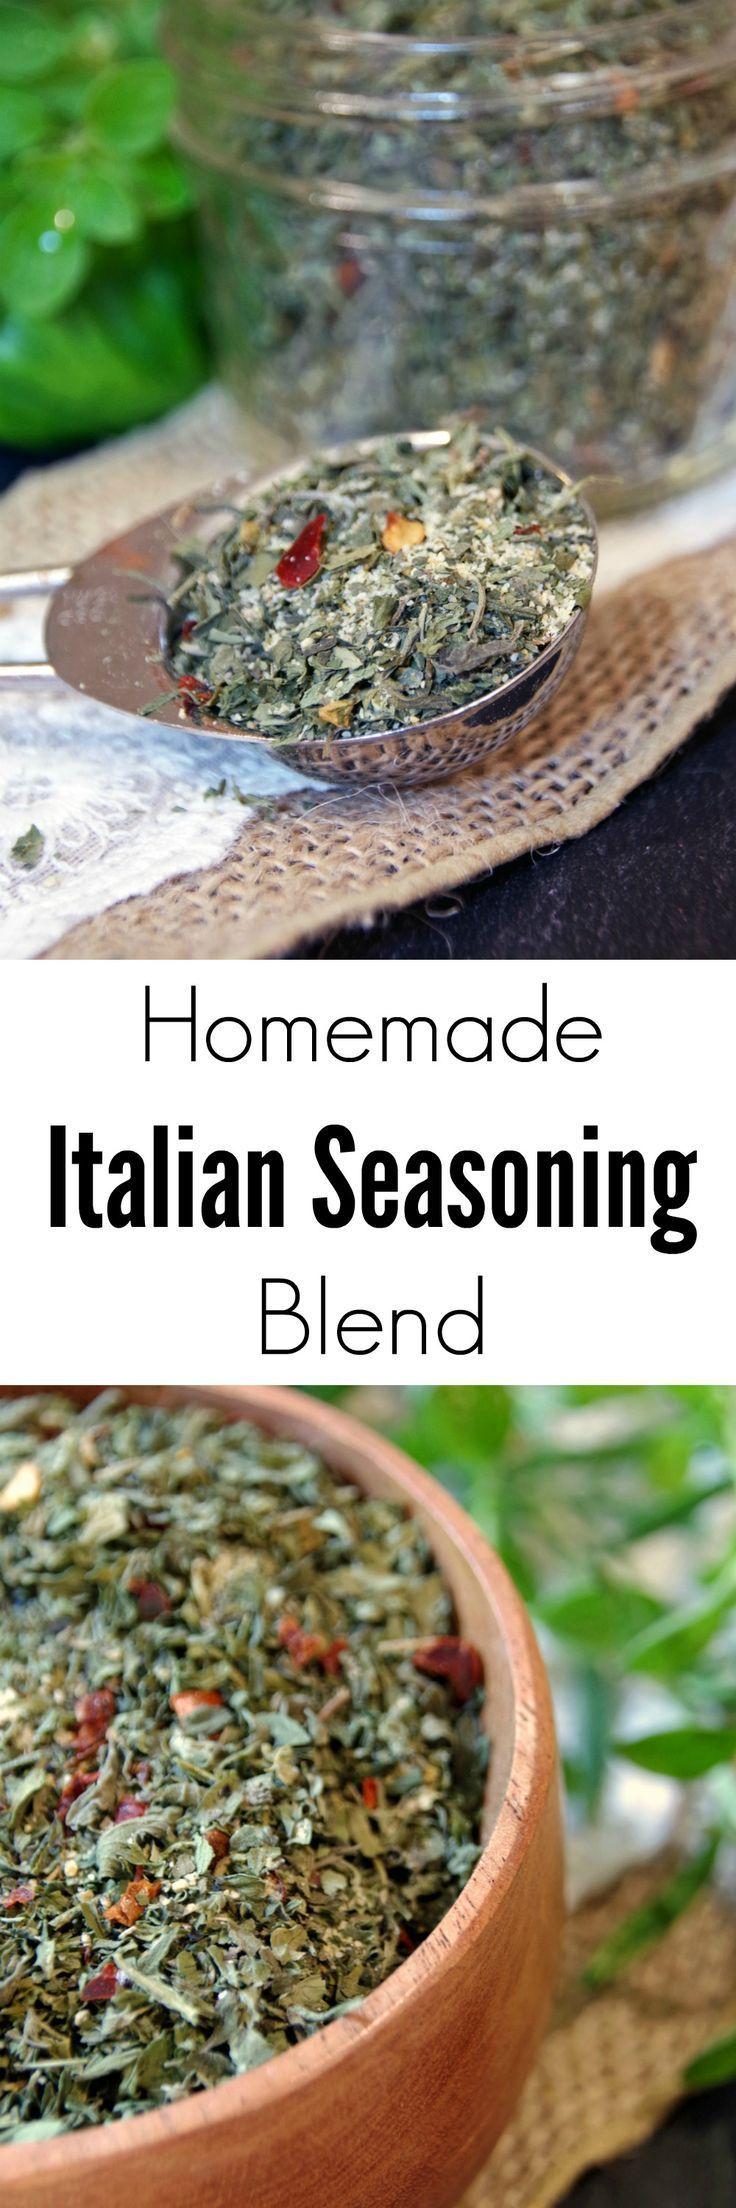 How to Make Homemade Italian Seasoning Mix